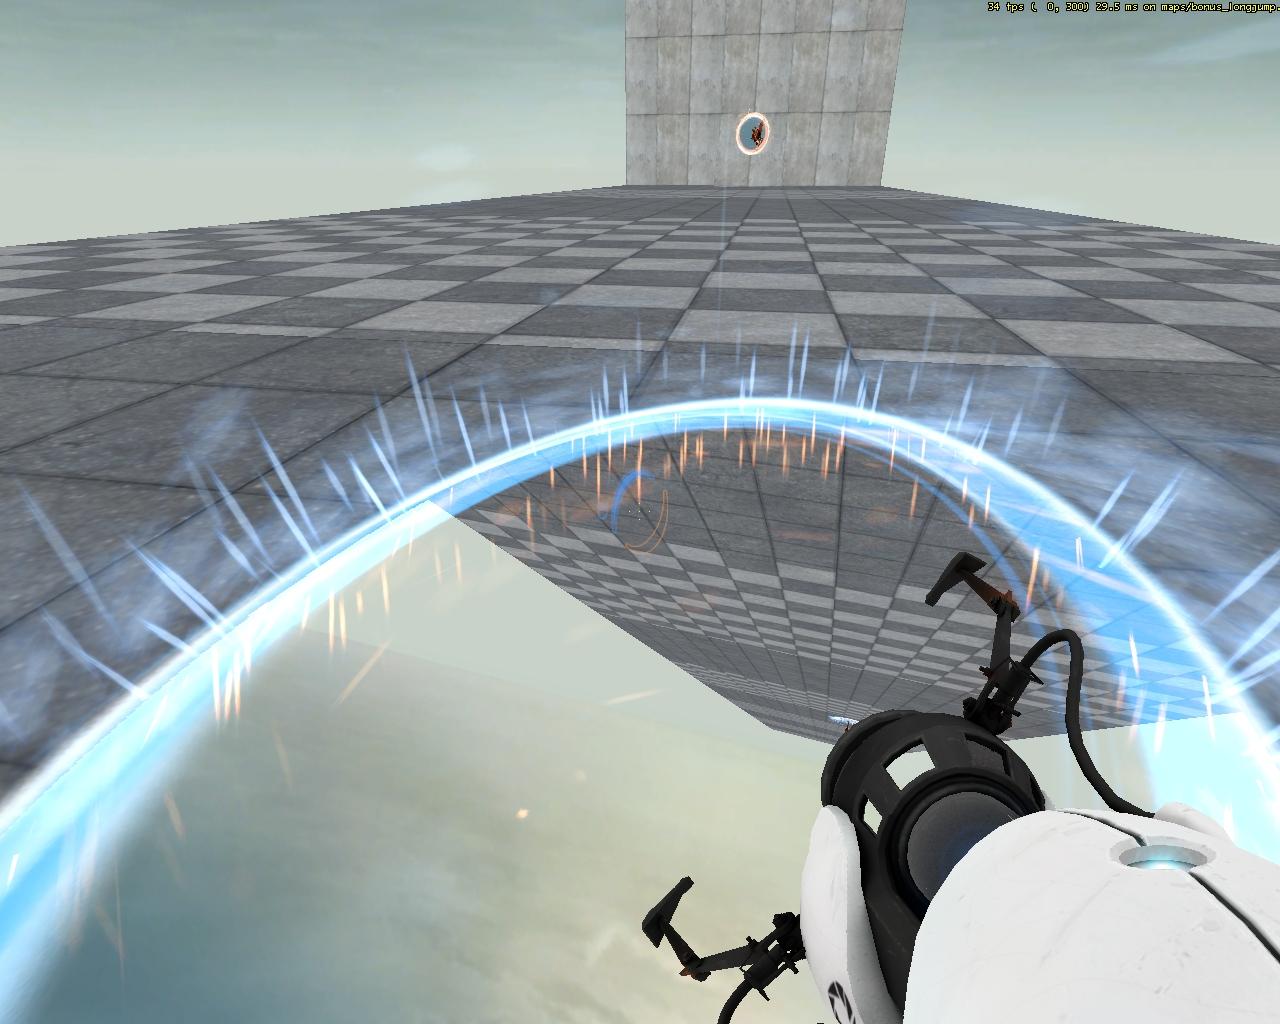 bonus_longjump0004.jpg - Portal bonus_longjump, Portal 2006, Portal Beta